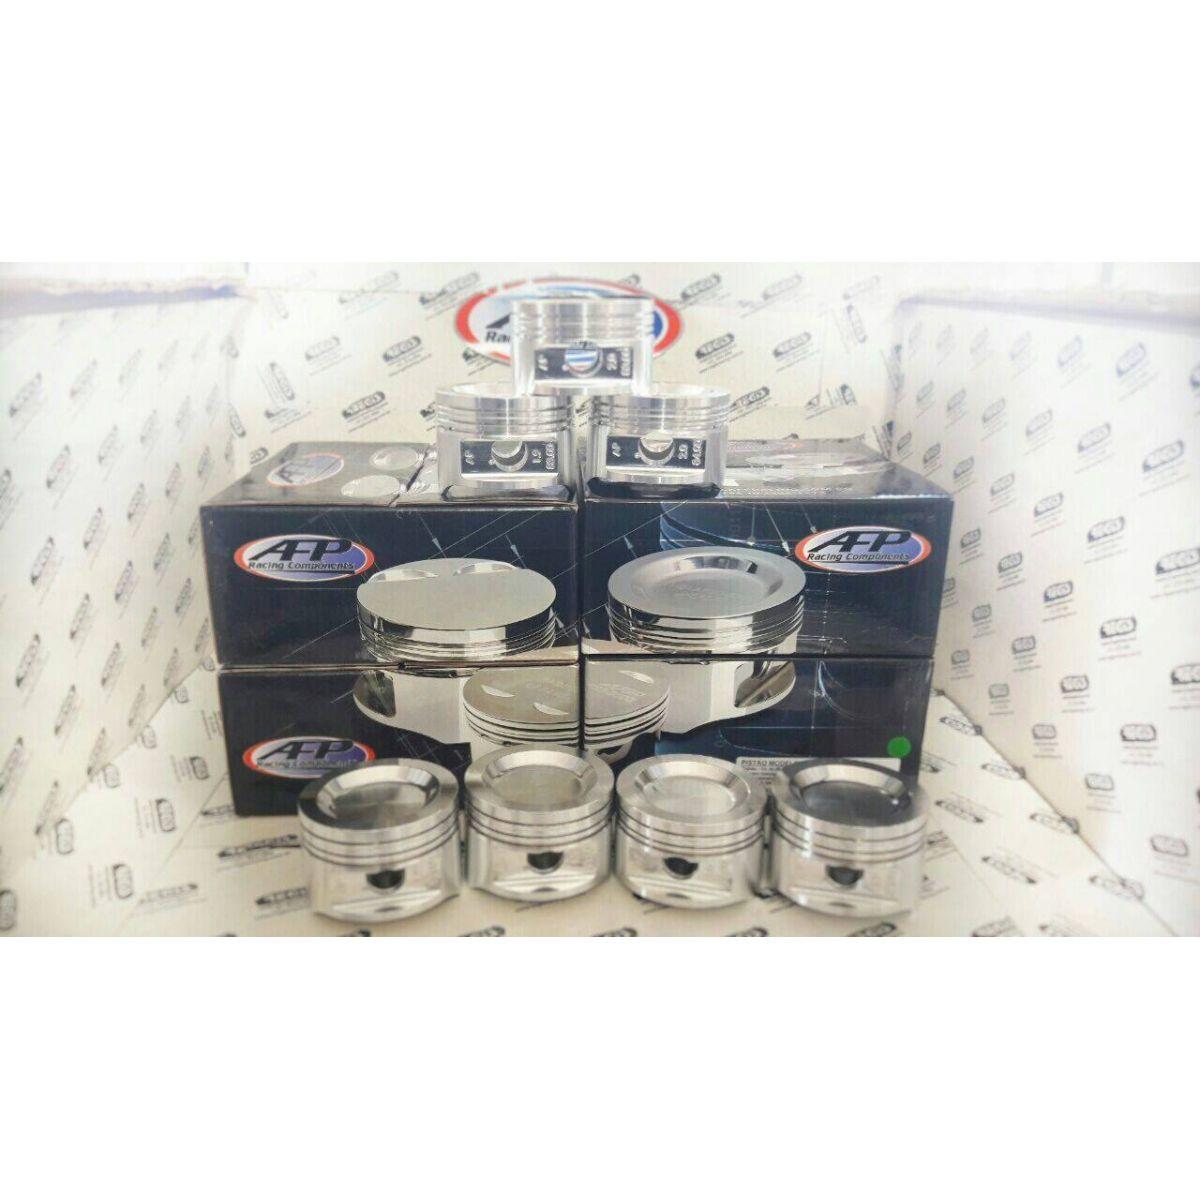 Pistao AFP Liquid Forged VW AP 2.0 84,00mm p/ 800cv